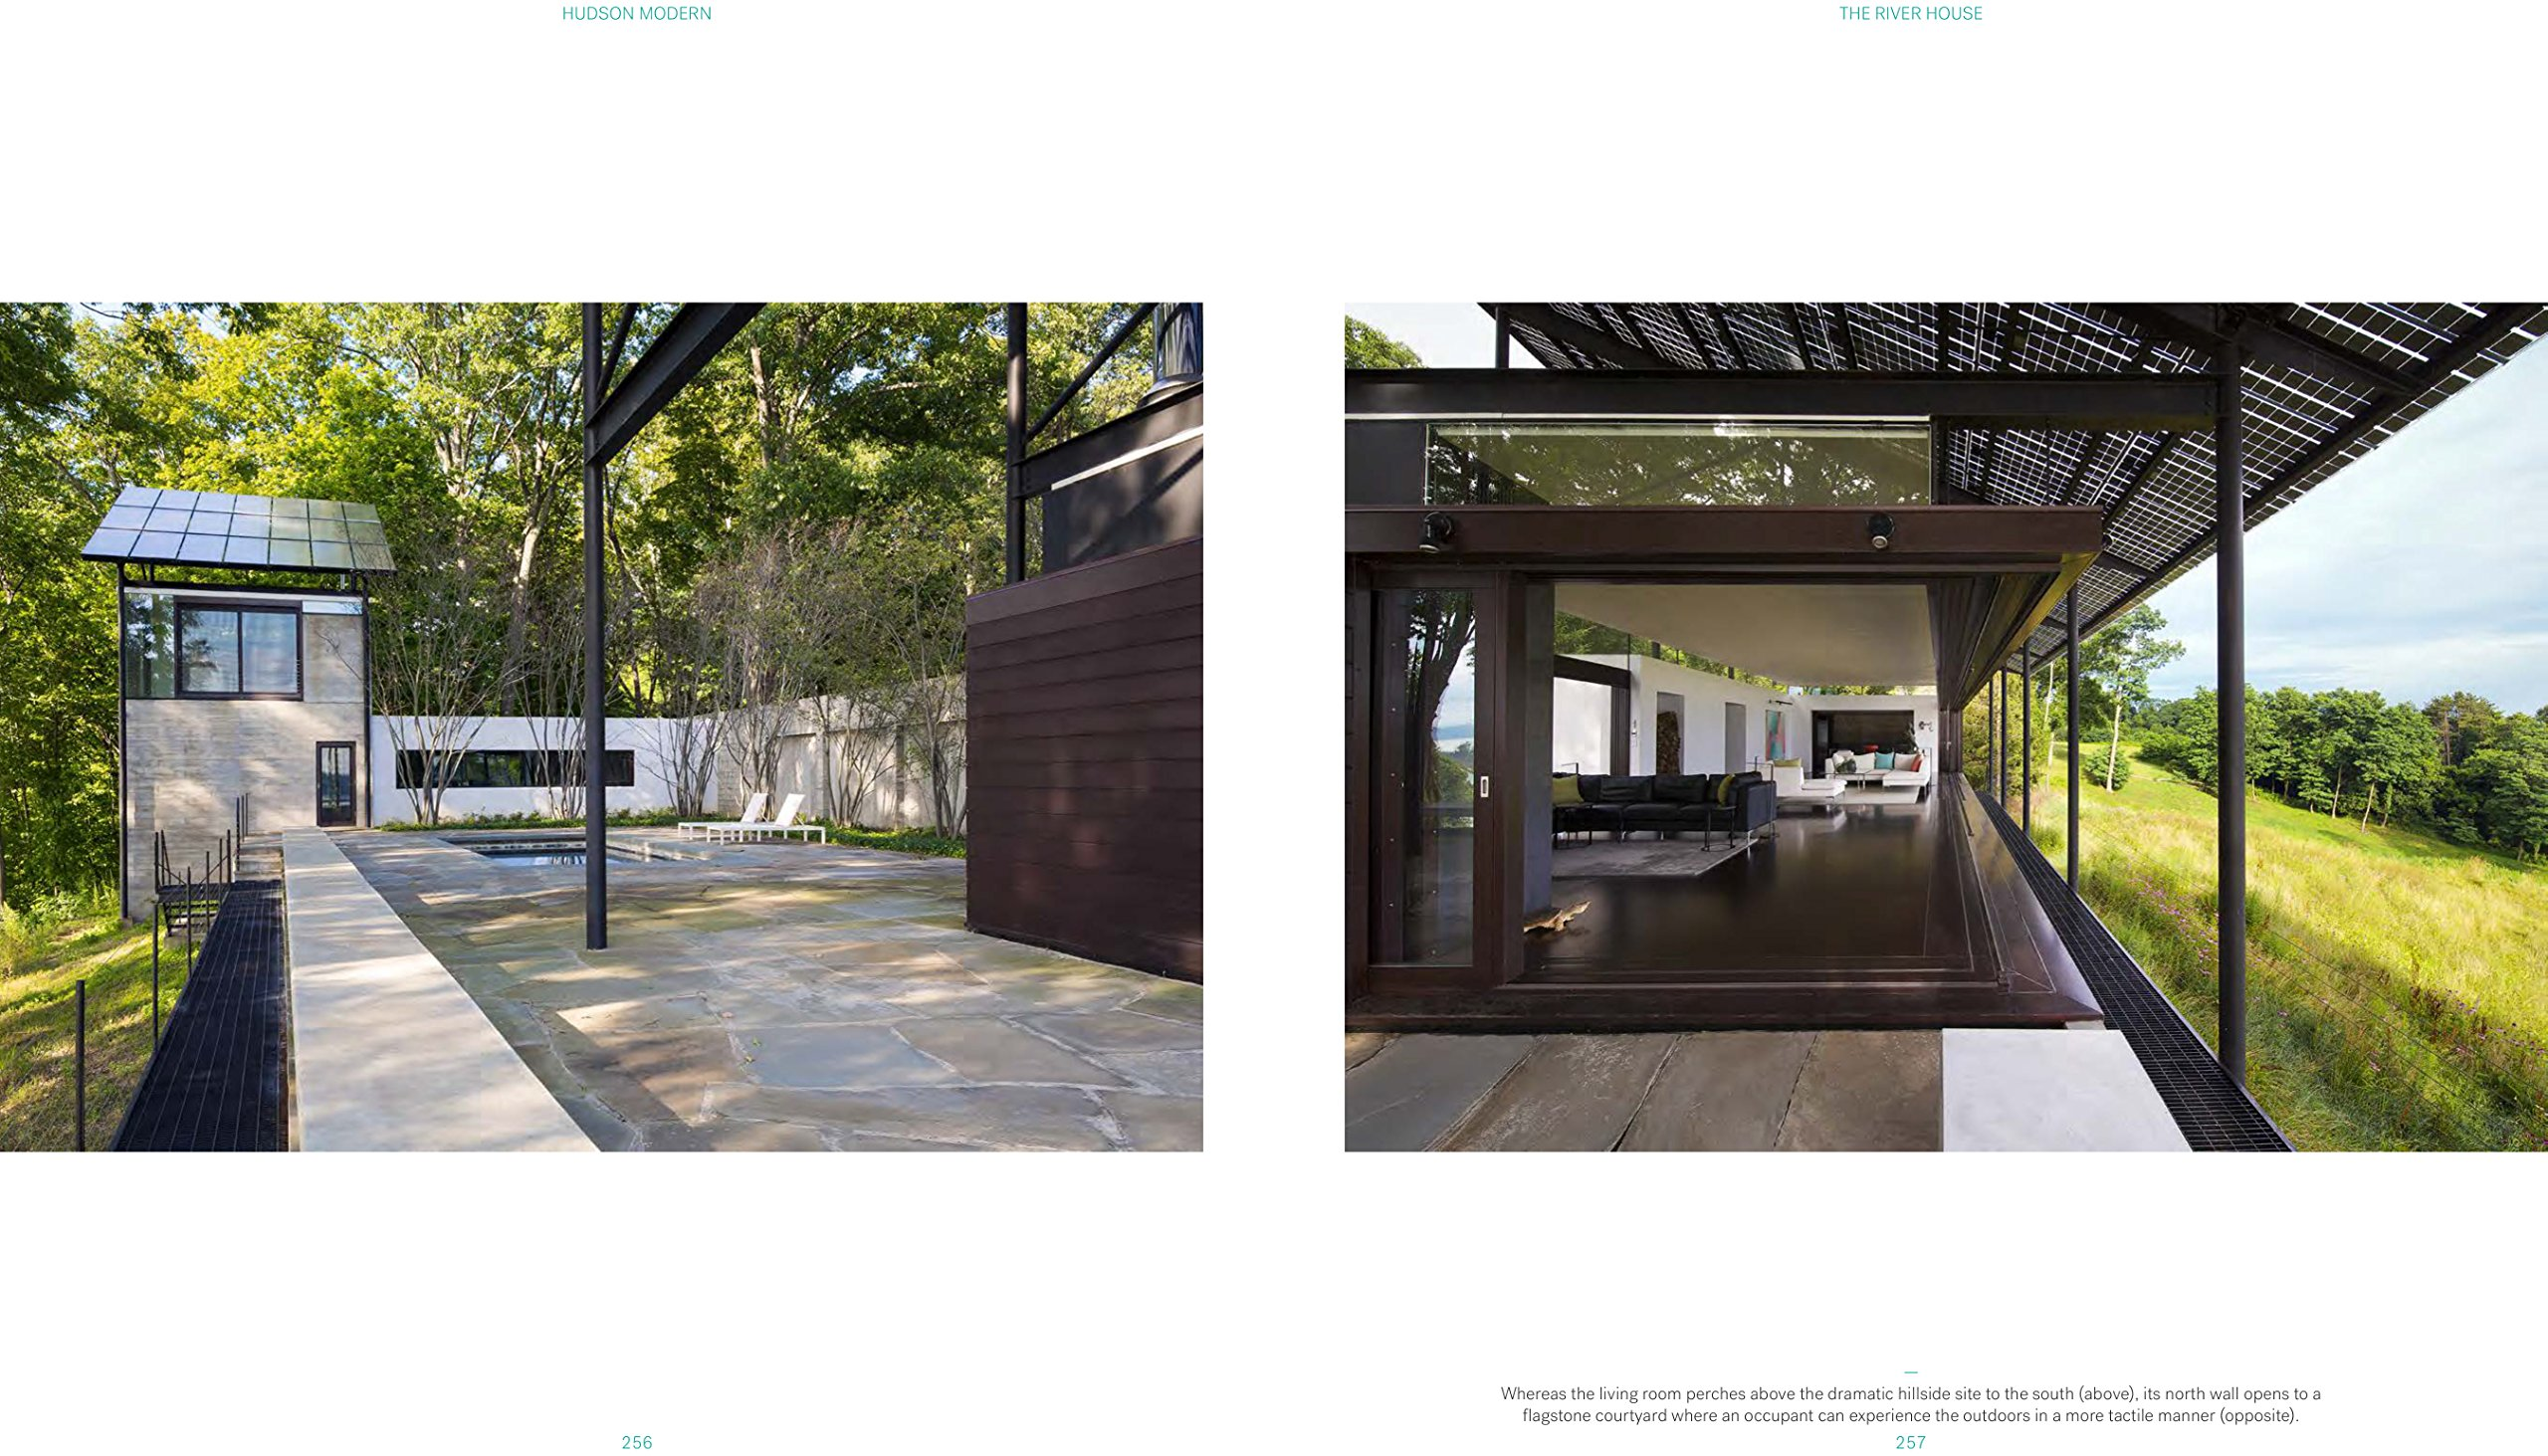 Hudson Modern Residential Landscapes David Sokol 9781580934848